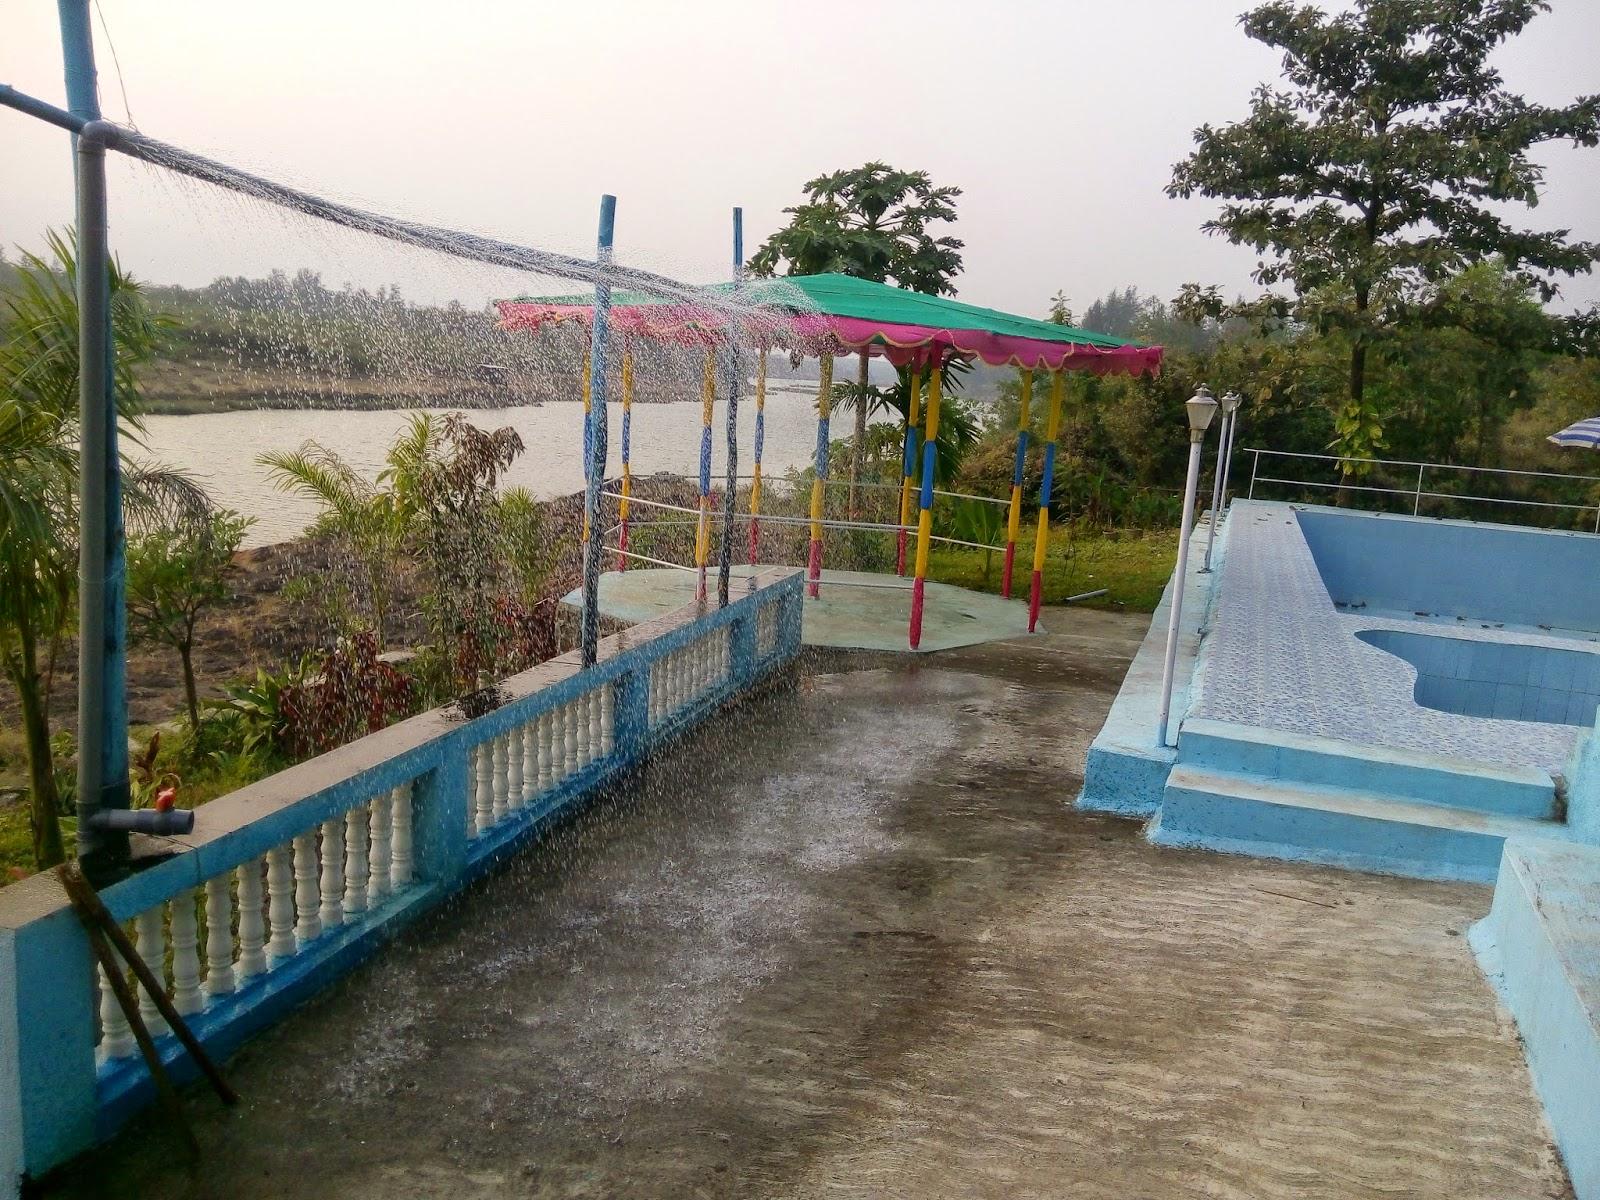 Wwwway2picniccom Agro Farm Badlapur Vangani